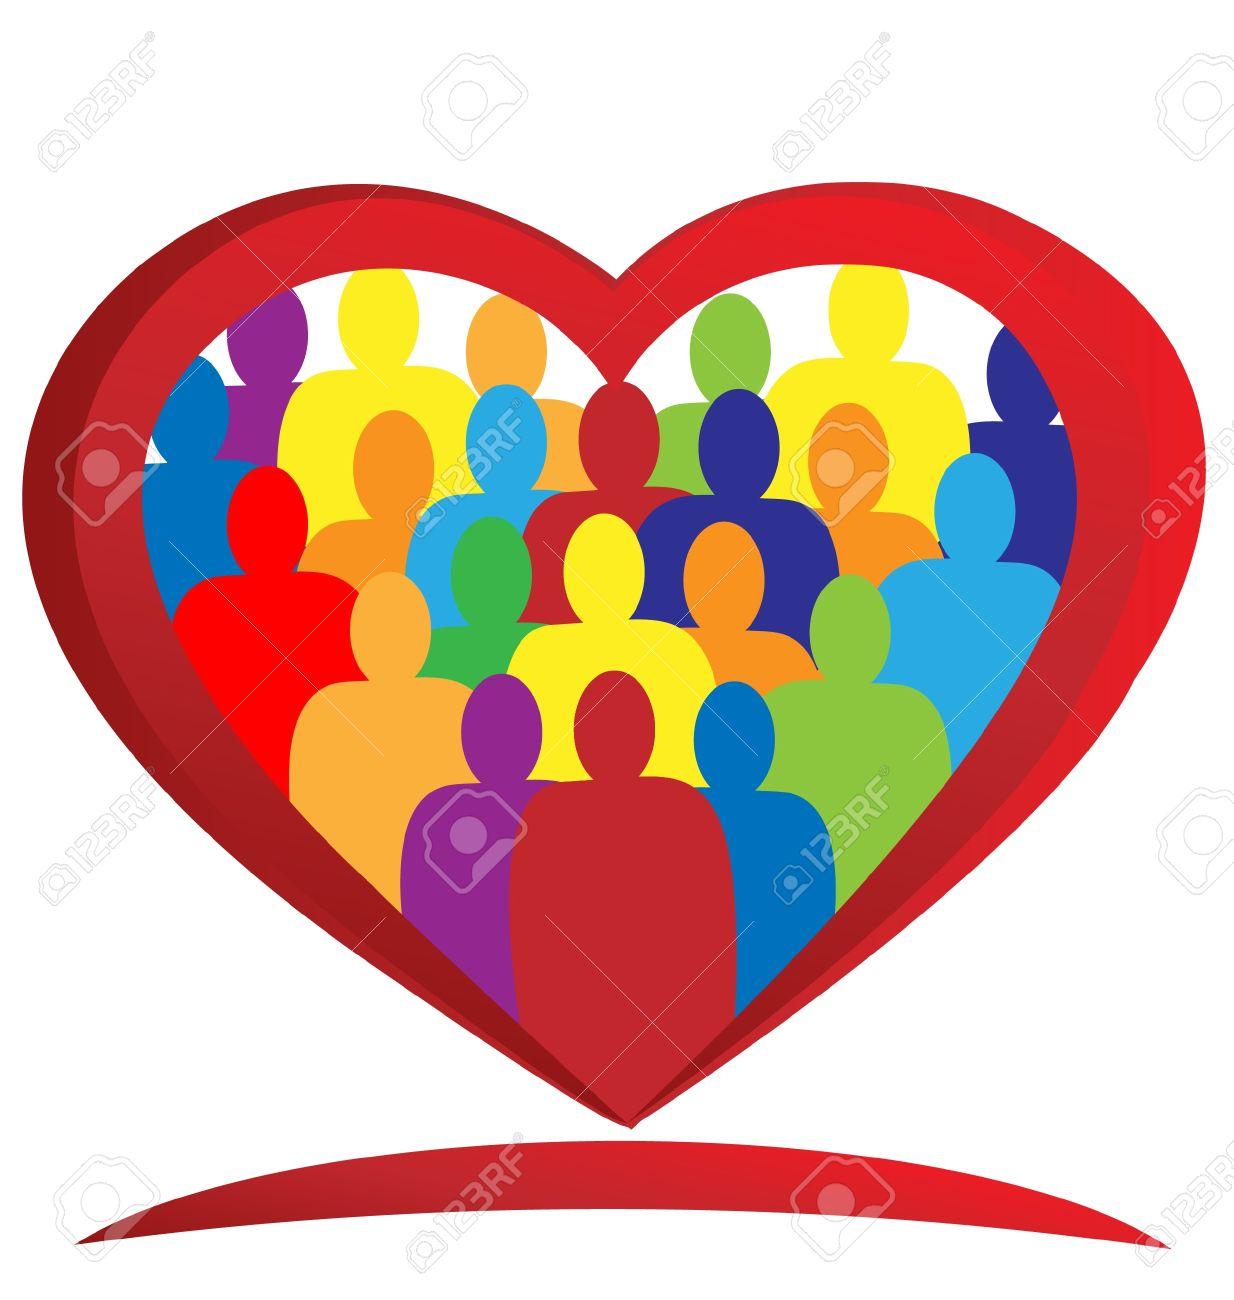 Teamwork heart diversity people logo vector Stock Vector - 14308525